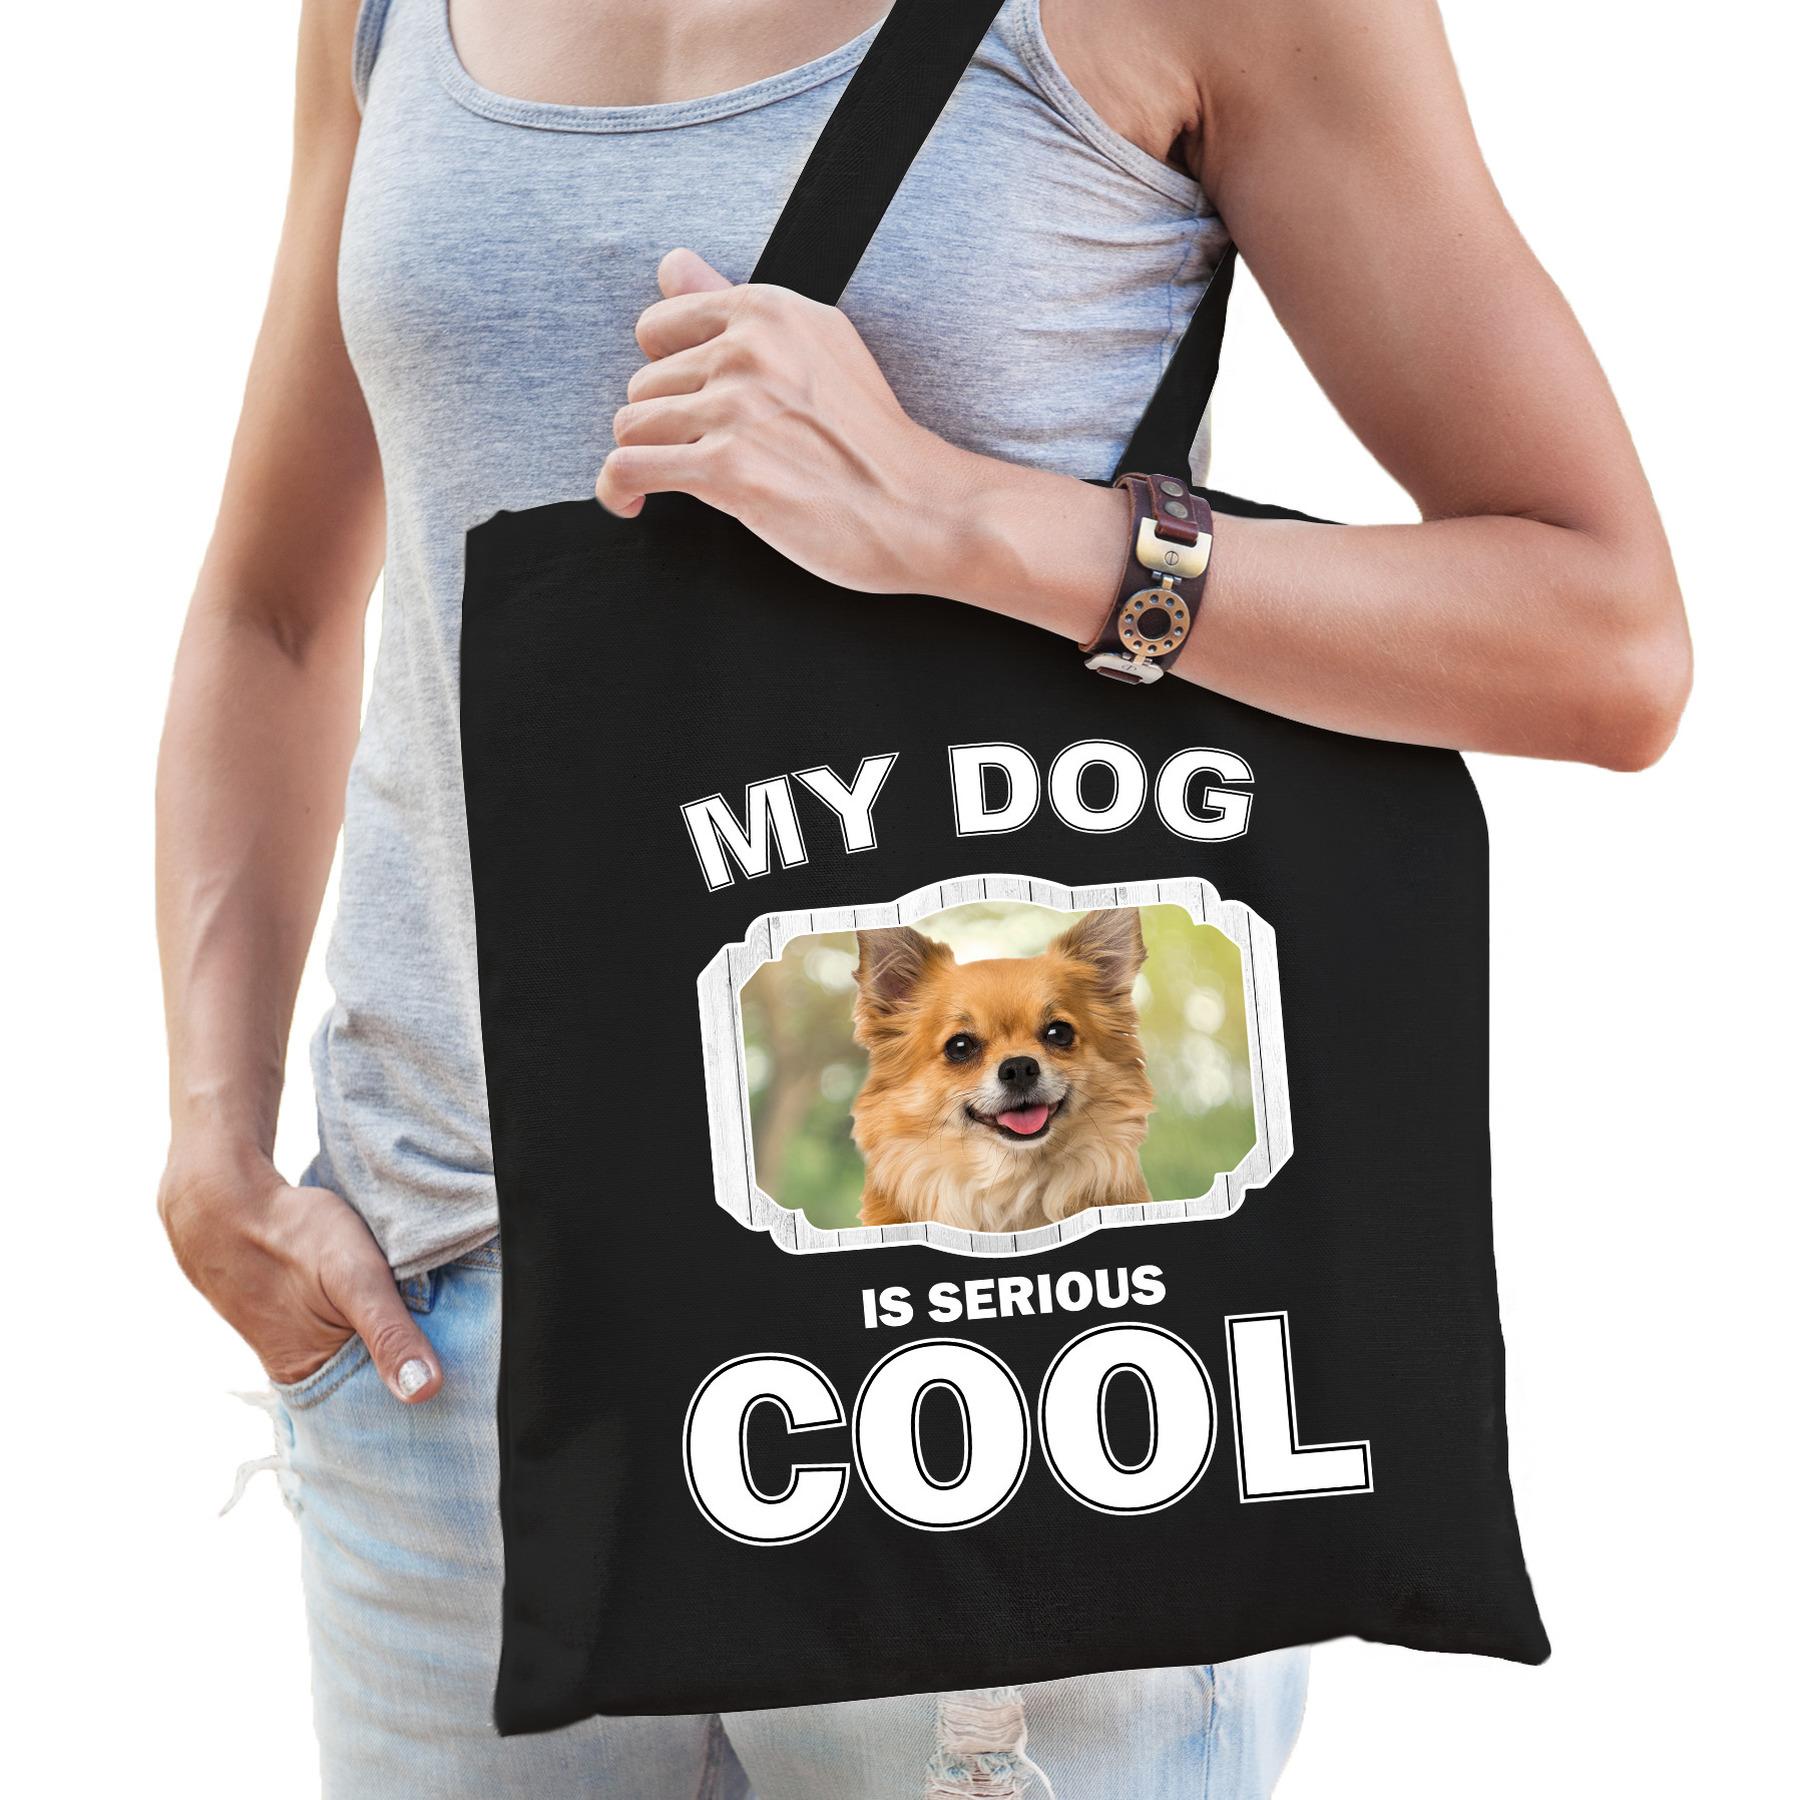 Katoenen tasje my dog is serious cool zwart - Chihuahua honden cadeau tas